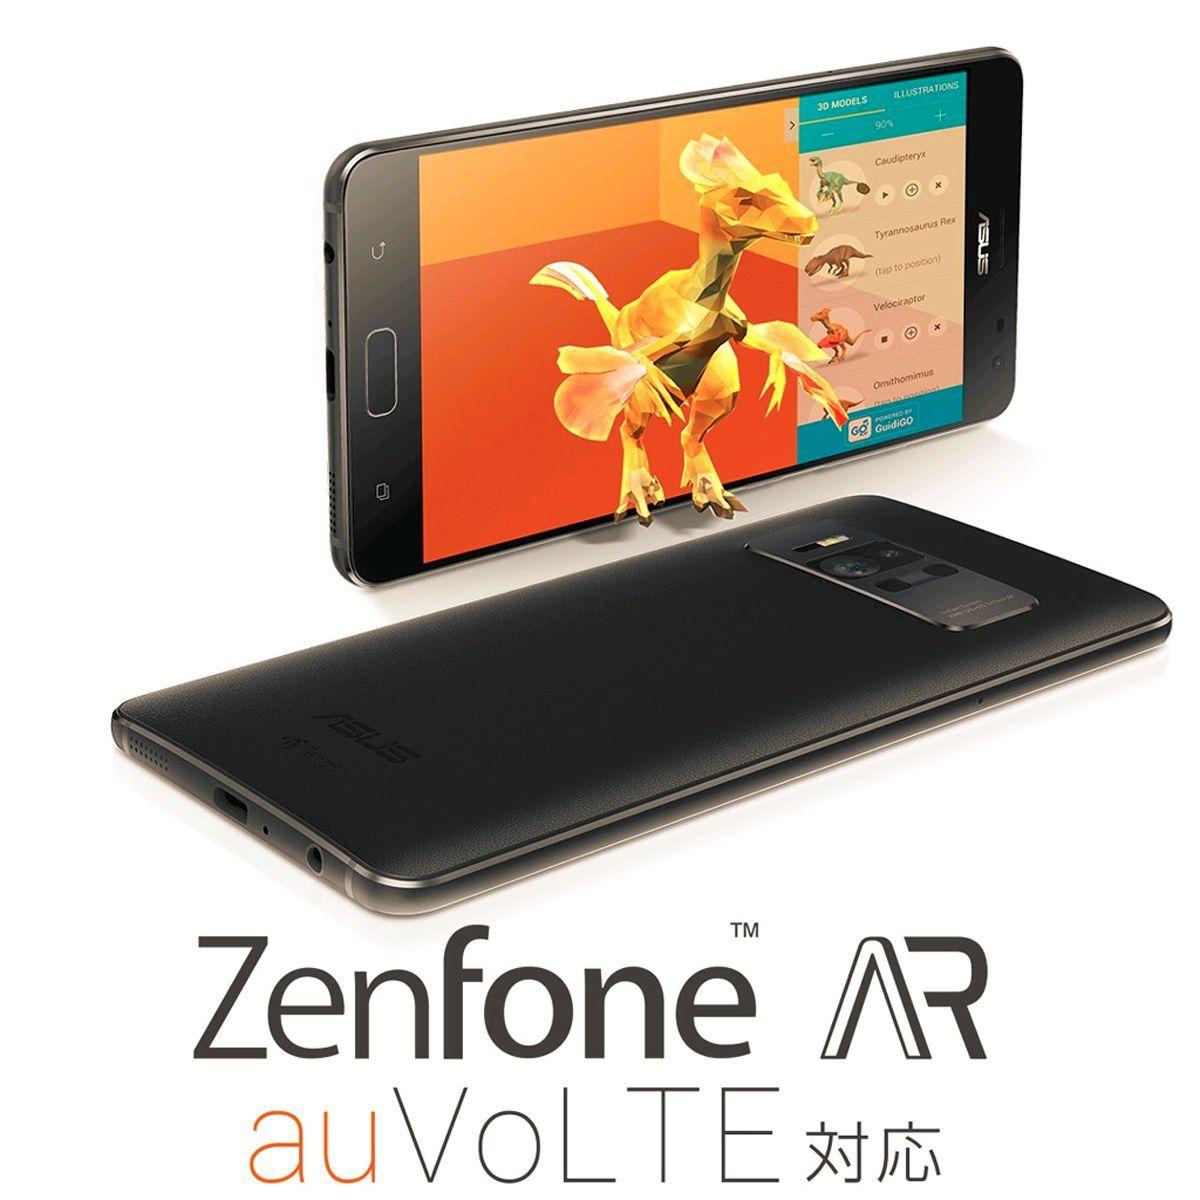 AR&VR対応のSIMフリースマホ「ZenFone AR」でau VoLTEが利用可能に